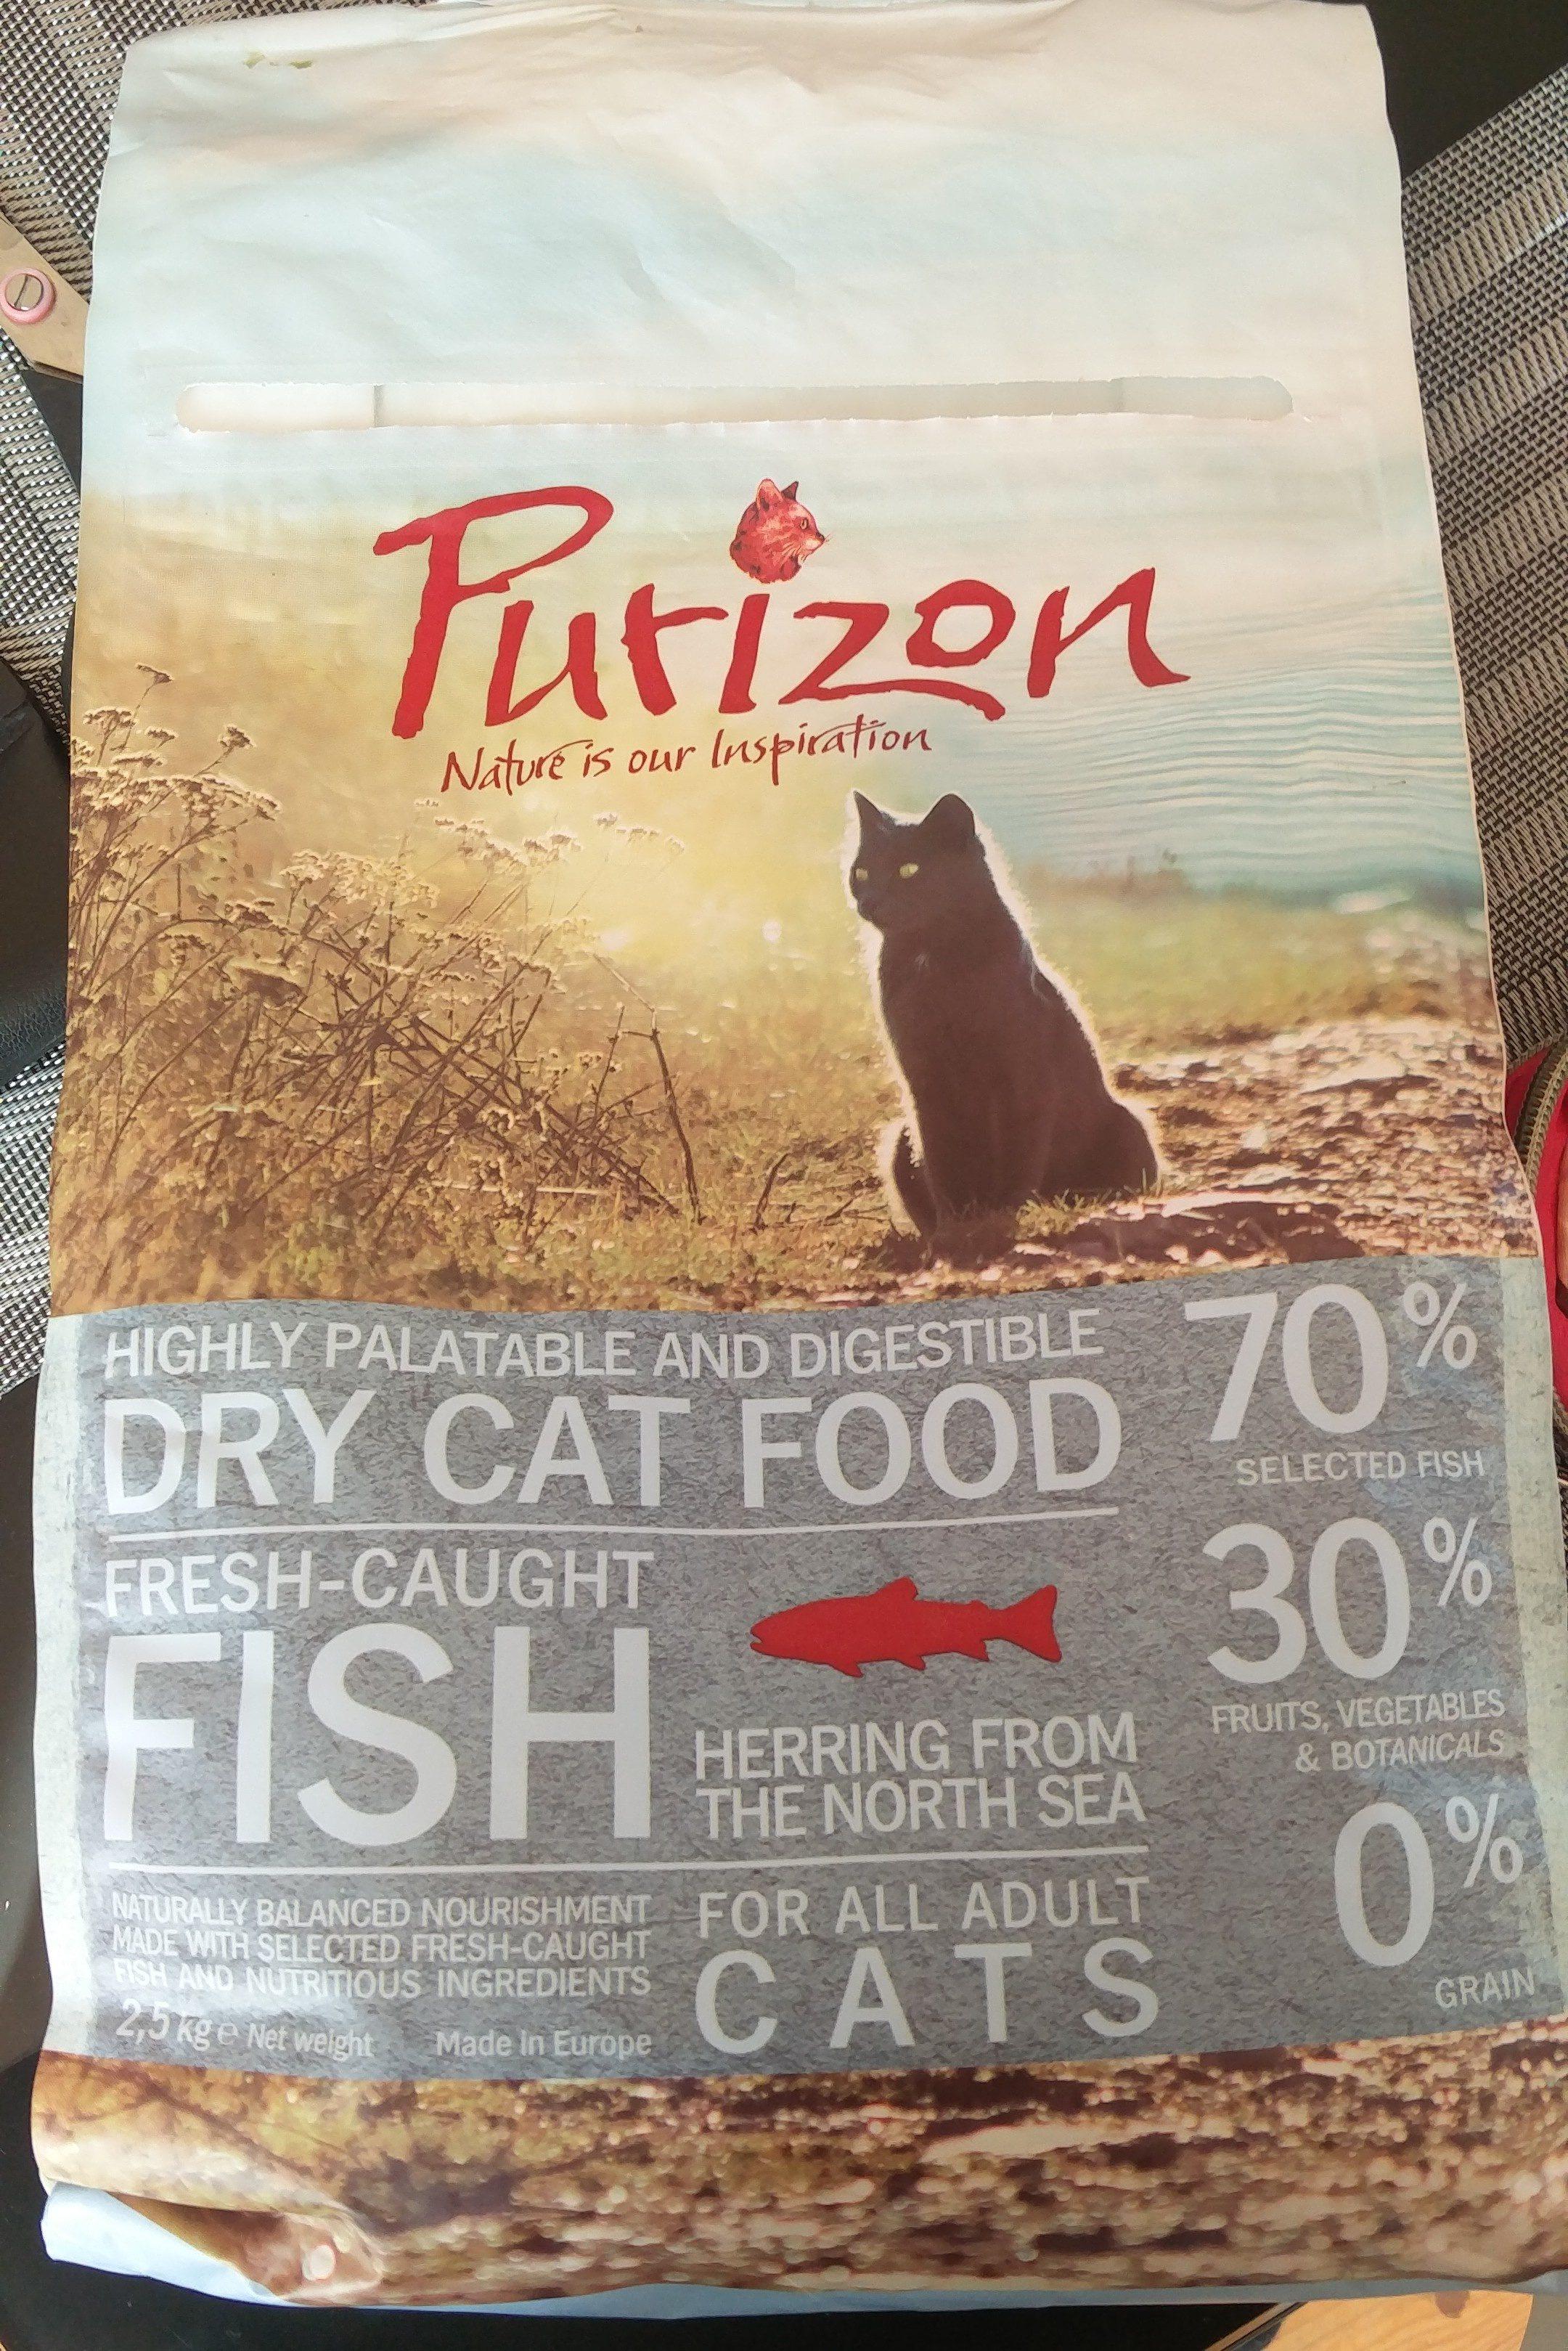 Dry cat food fresh-Caught Fish - Product